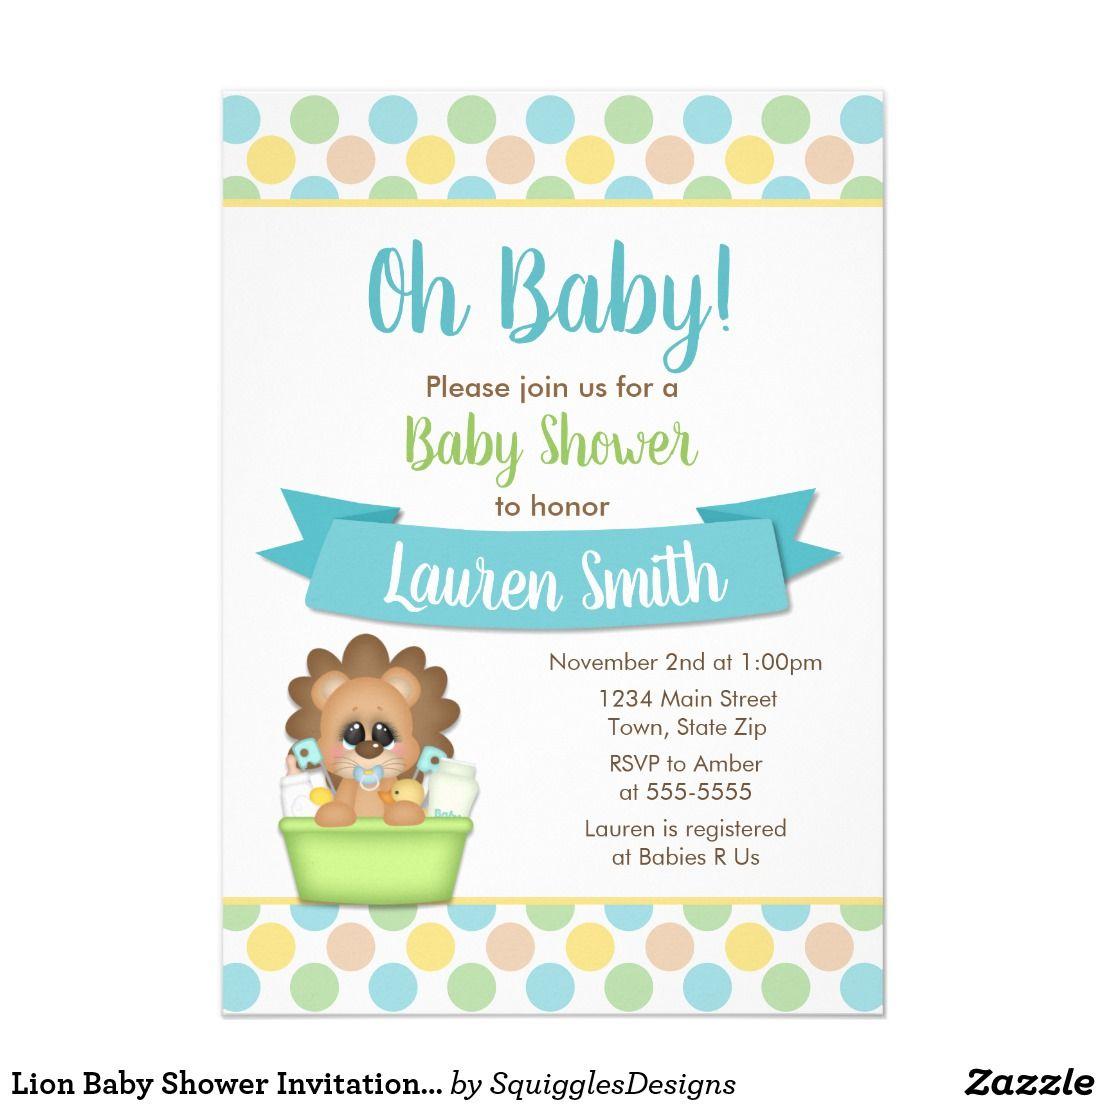 Lion Baby Shower Invitation Blue Baby Boy Lion | Lion baby shower ...